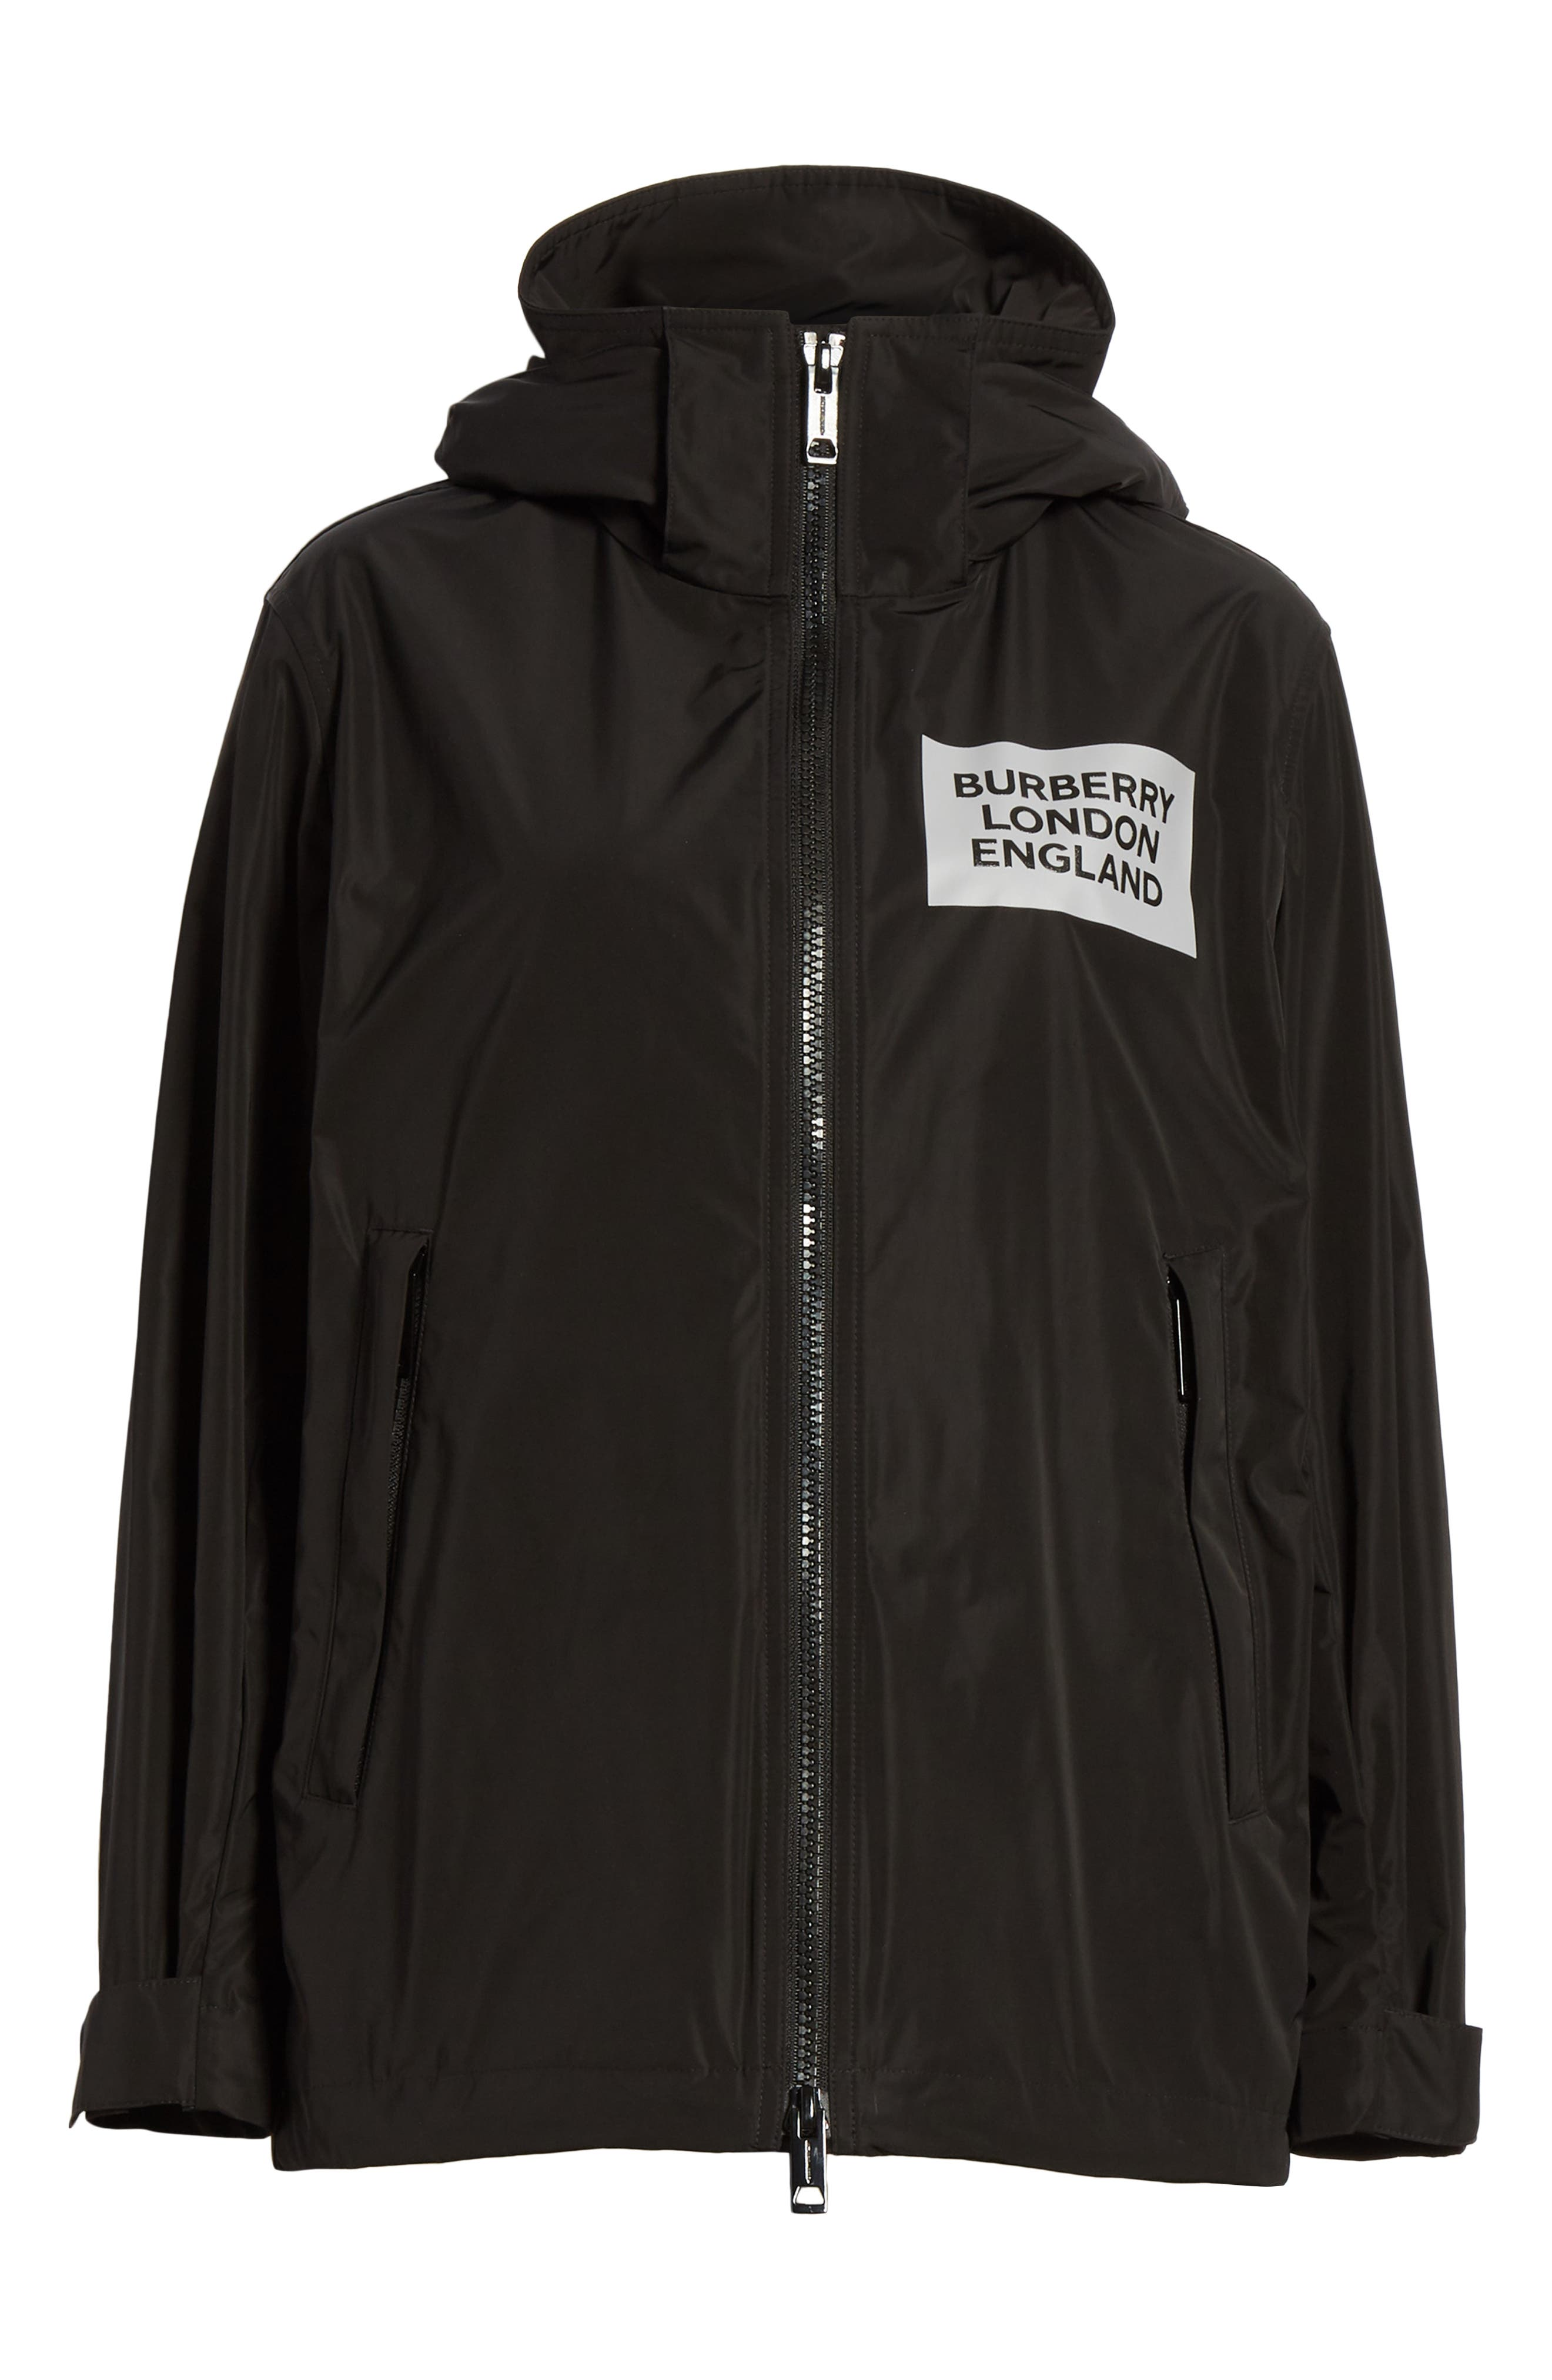 BURBERRY, Kway Millport Logo Print Waterproof Taffeta Jacket, Alternate thumbnail 6, color, BLACK